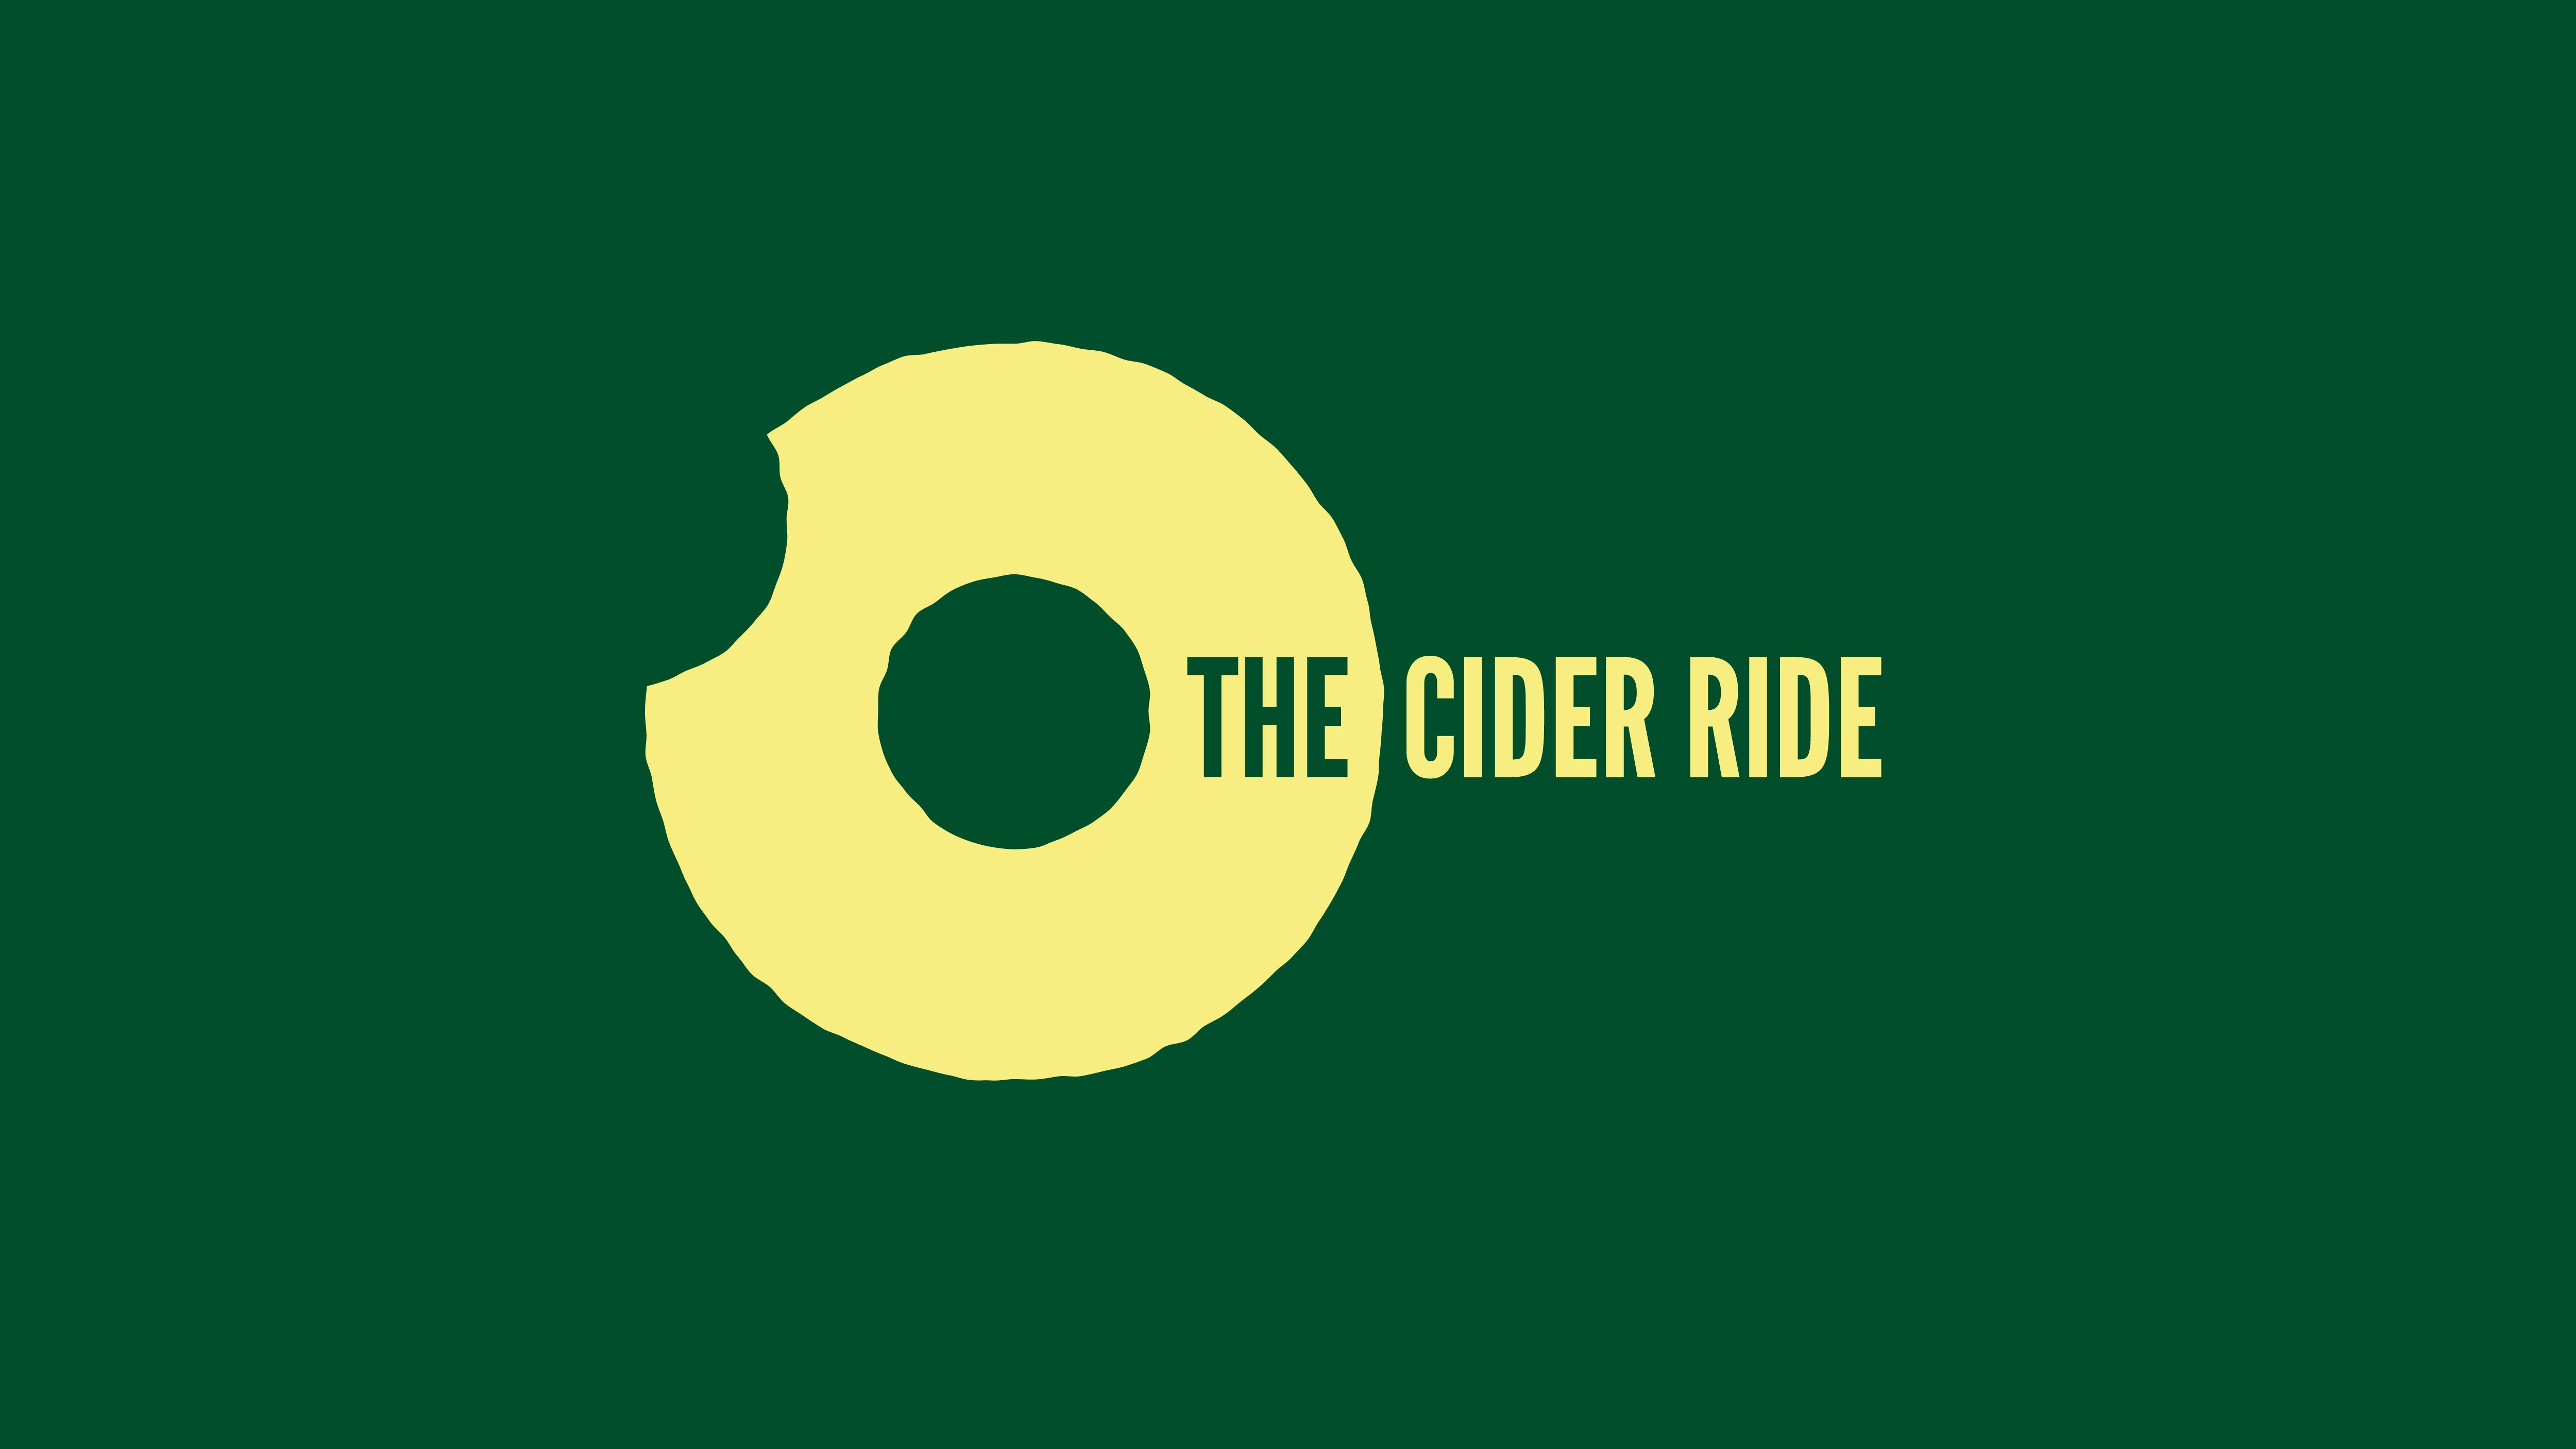 The Cider Ride